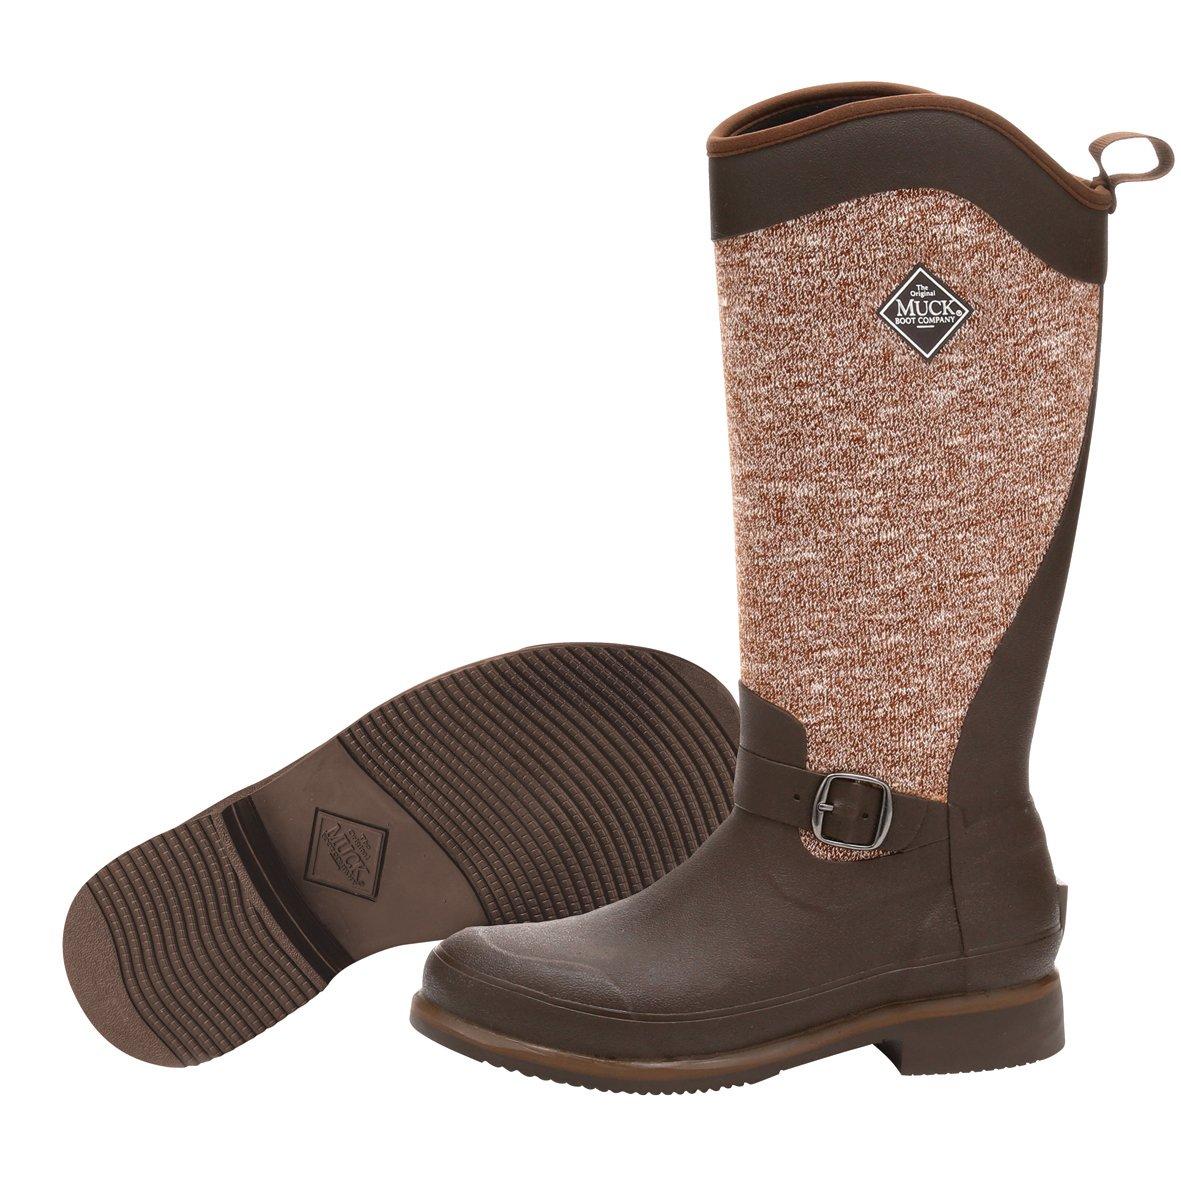 Muck Boot Women's Reign Supreme Snow B01K8FKHAY 9 B(M) US|Brown/Bison